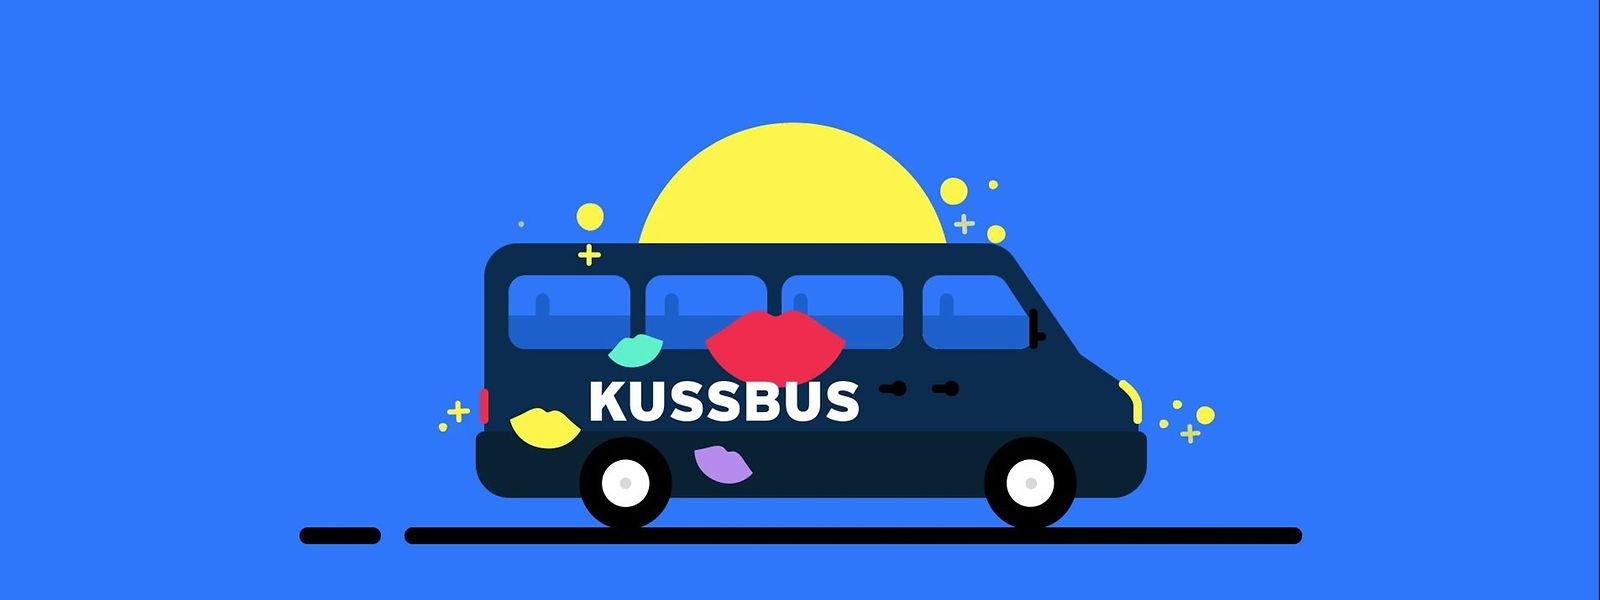 Kussbus entrera en service en septembre 2017.